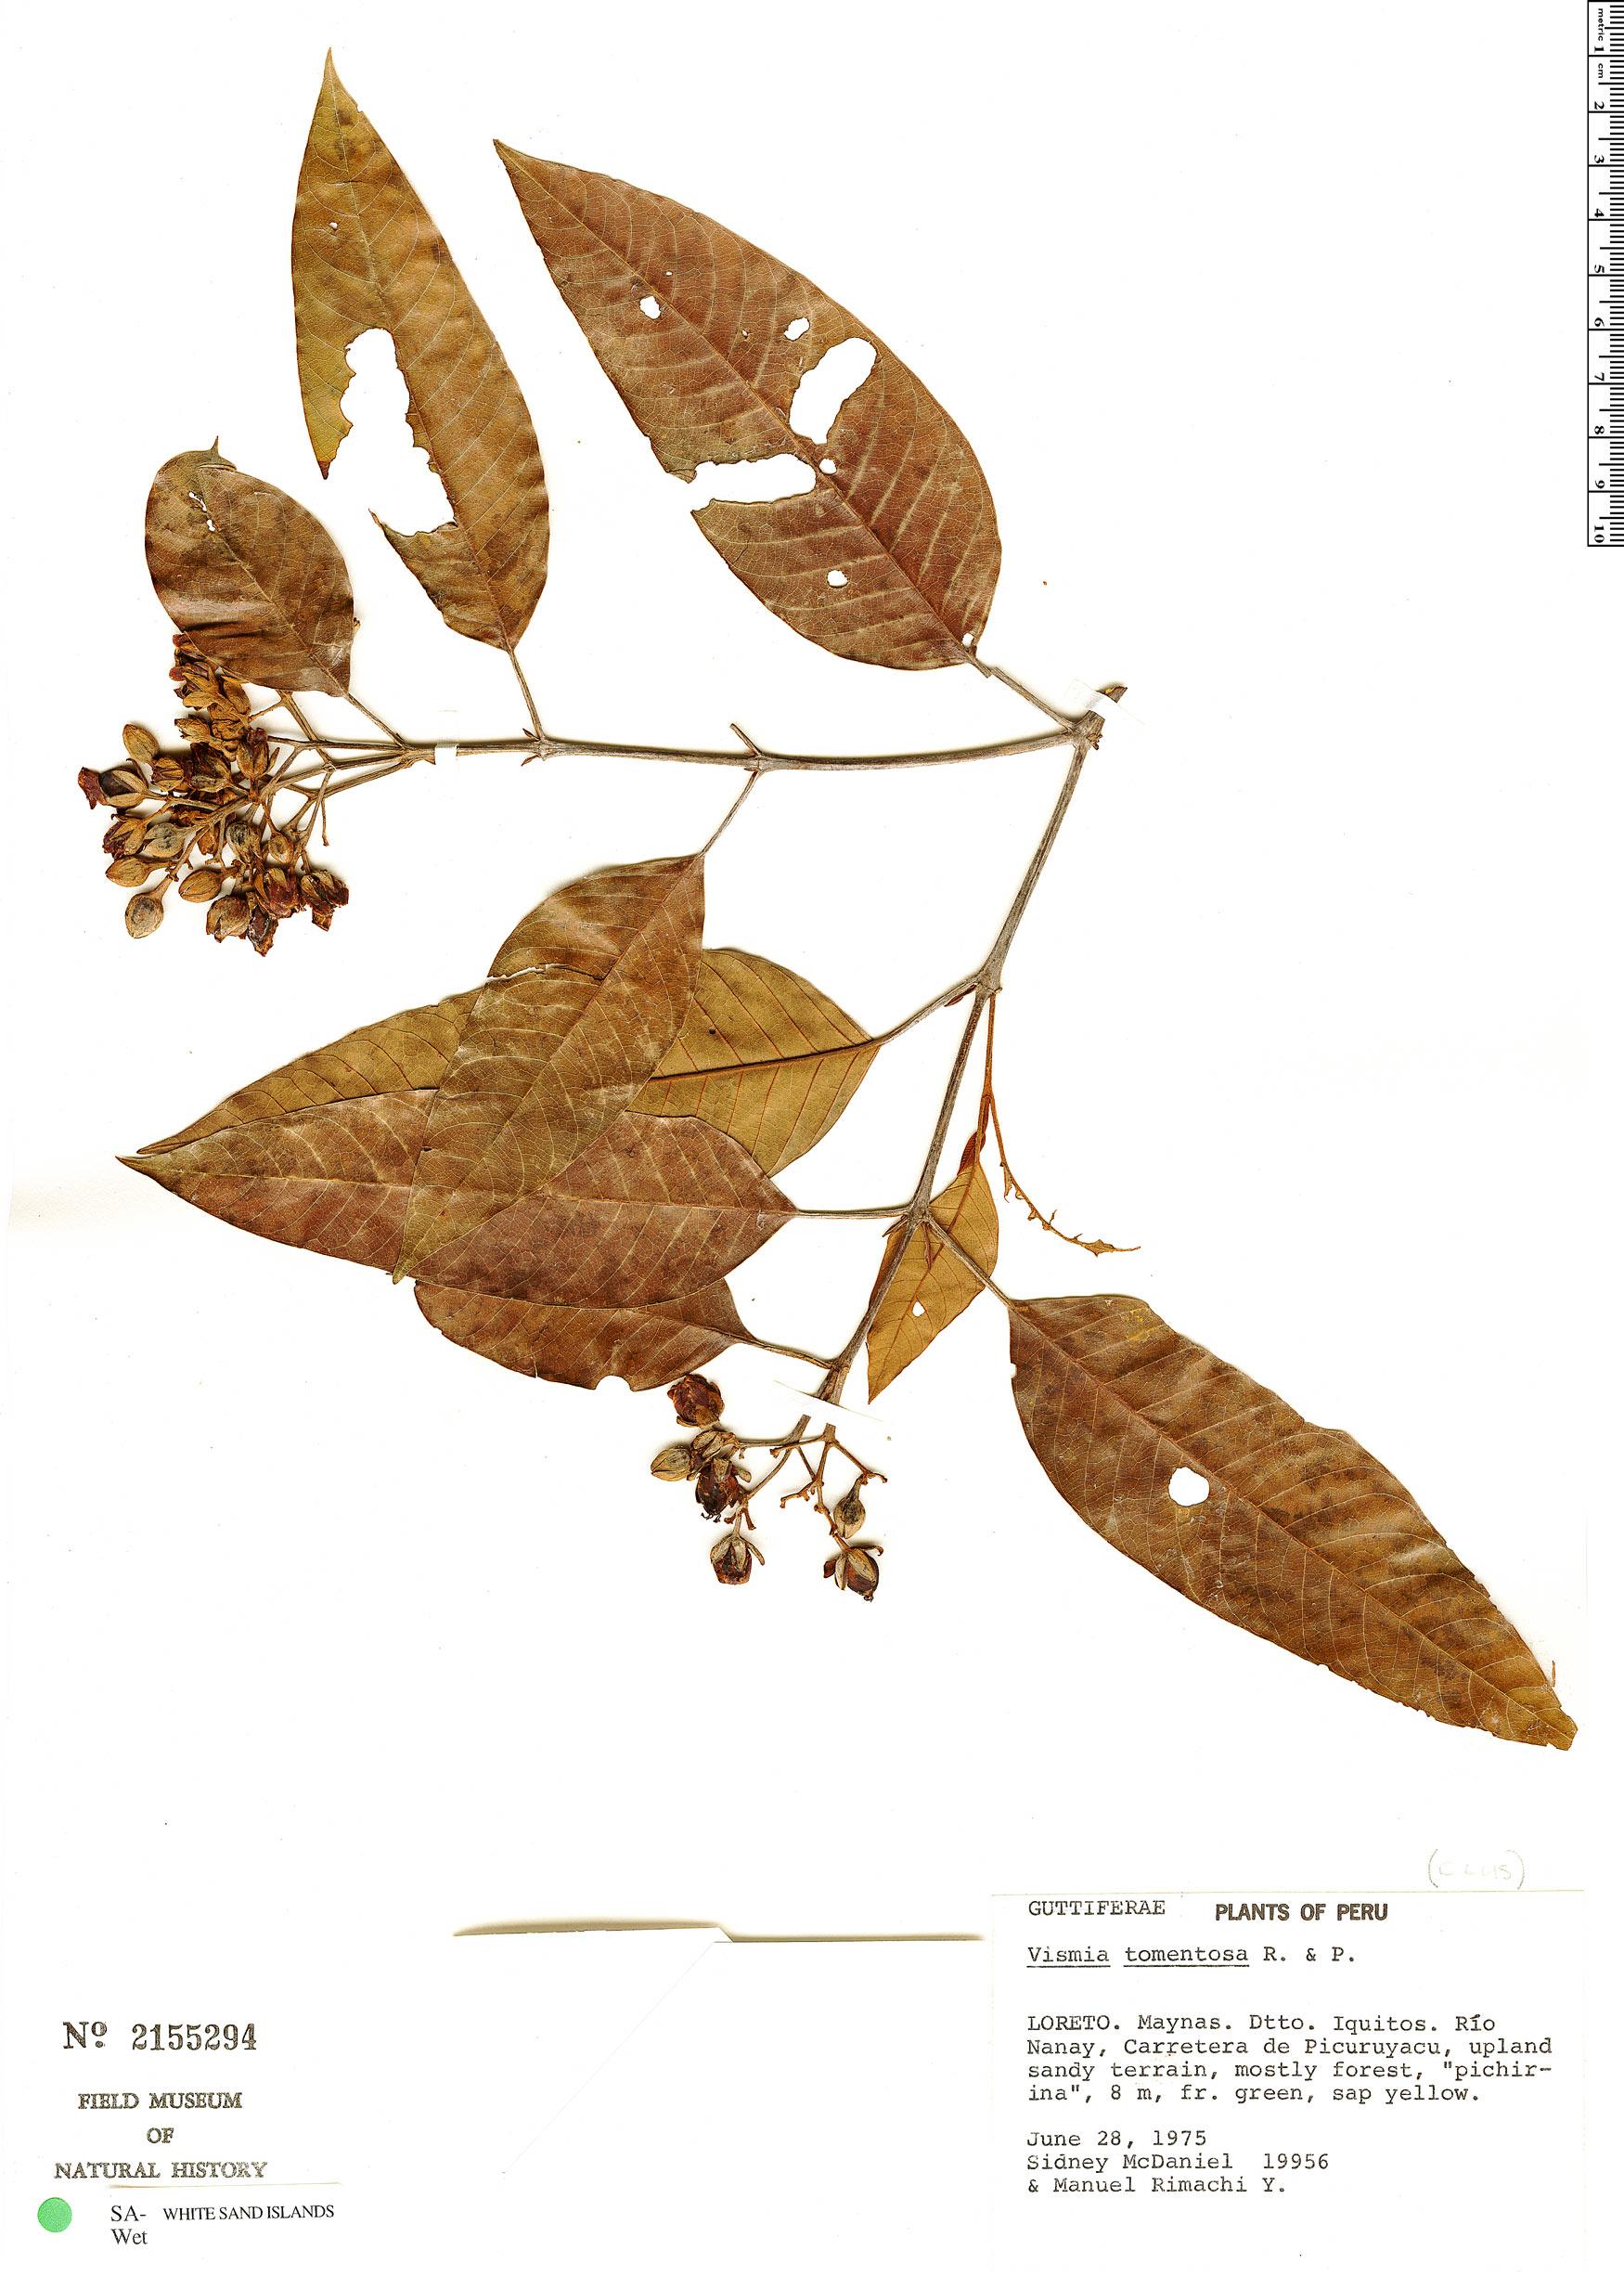 Espécimen: Vismia tomentosa